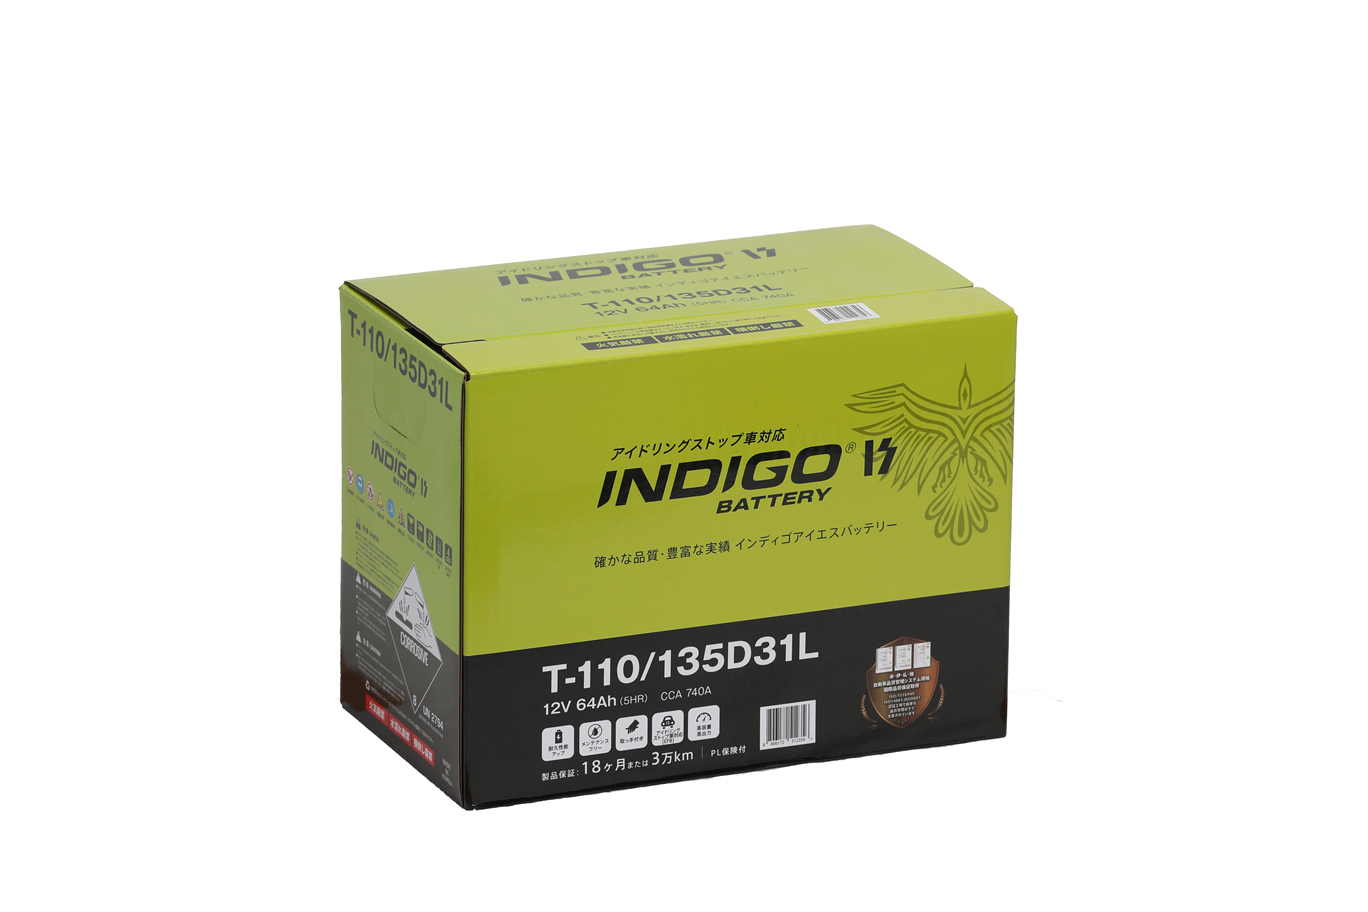 INDIGO インディゴ アイエスバッテリー T-110/135D31L  (L端子のみ) アイドリングストップ車対応バッテリー※沖縄/離島配送不可